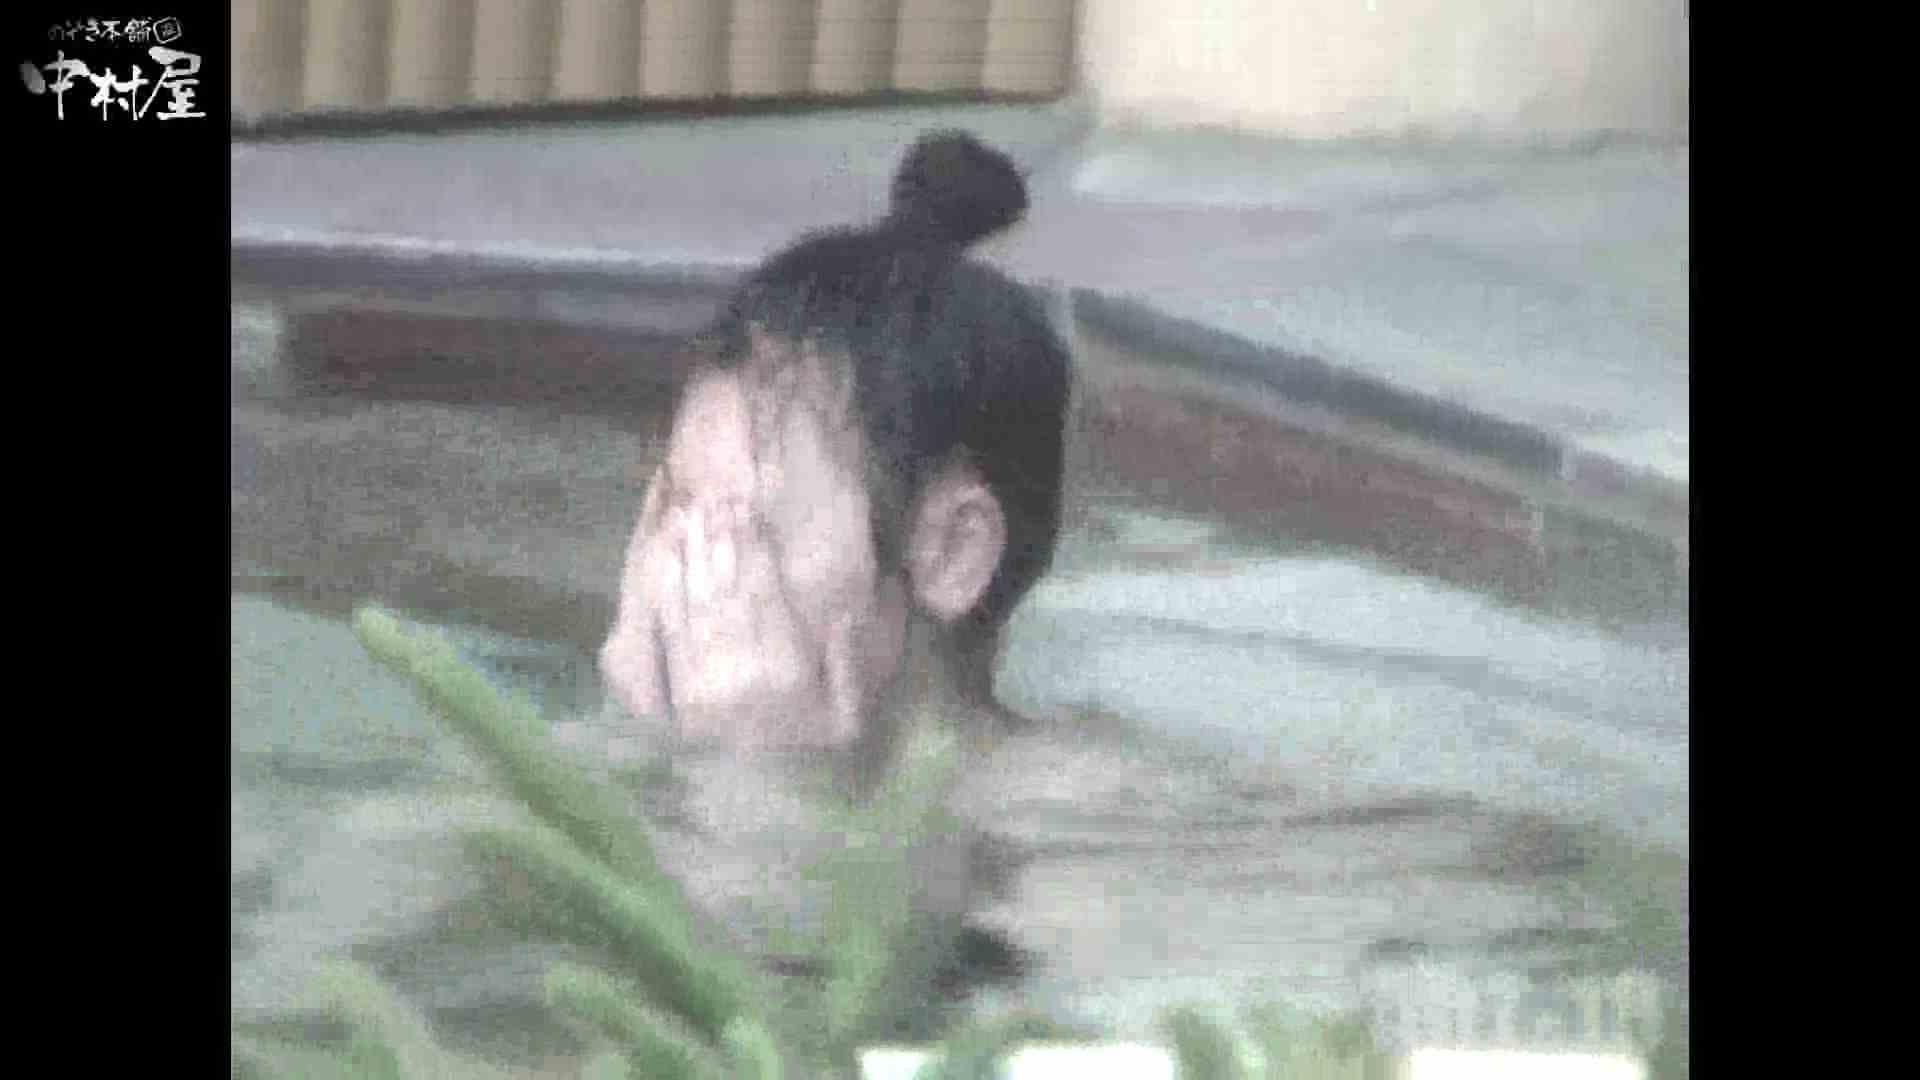 Aquaな露天風呂Vol.882潜入盗撮露天風呂十八判湯 其の二 露天  78PICs 36